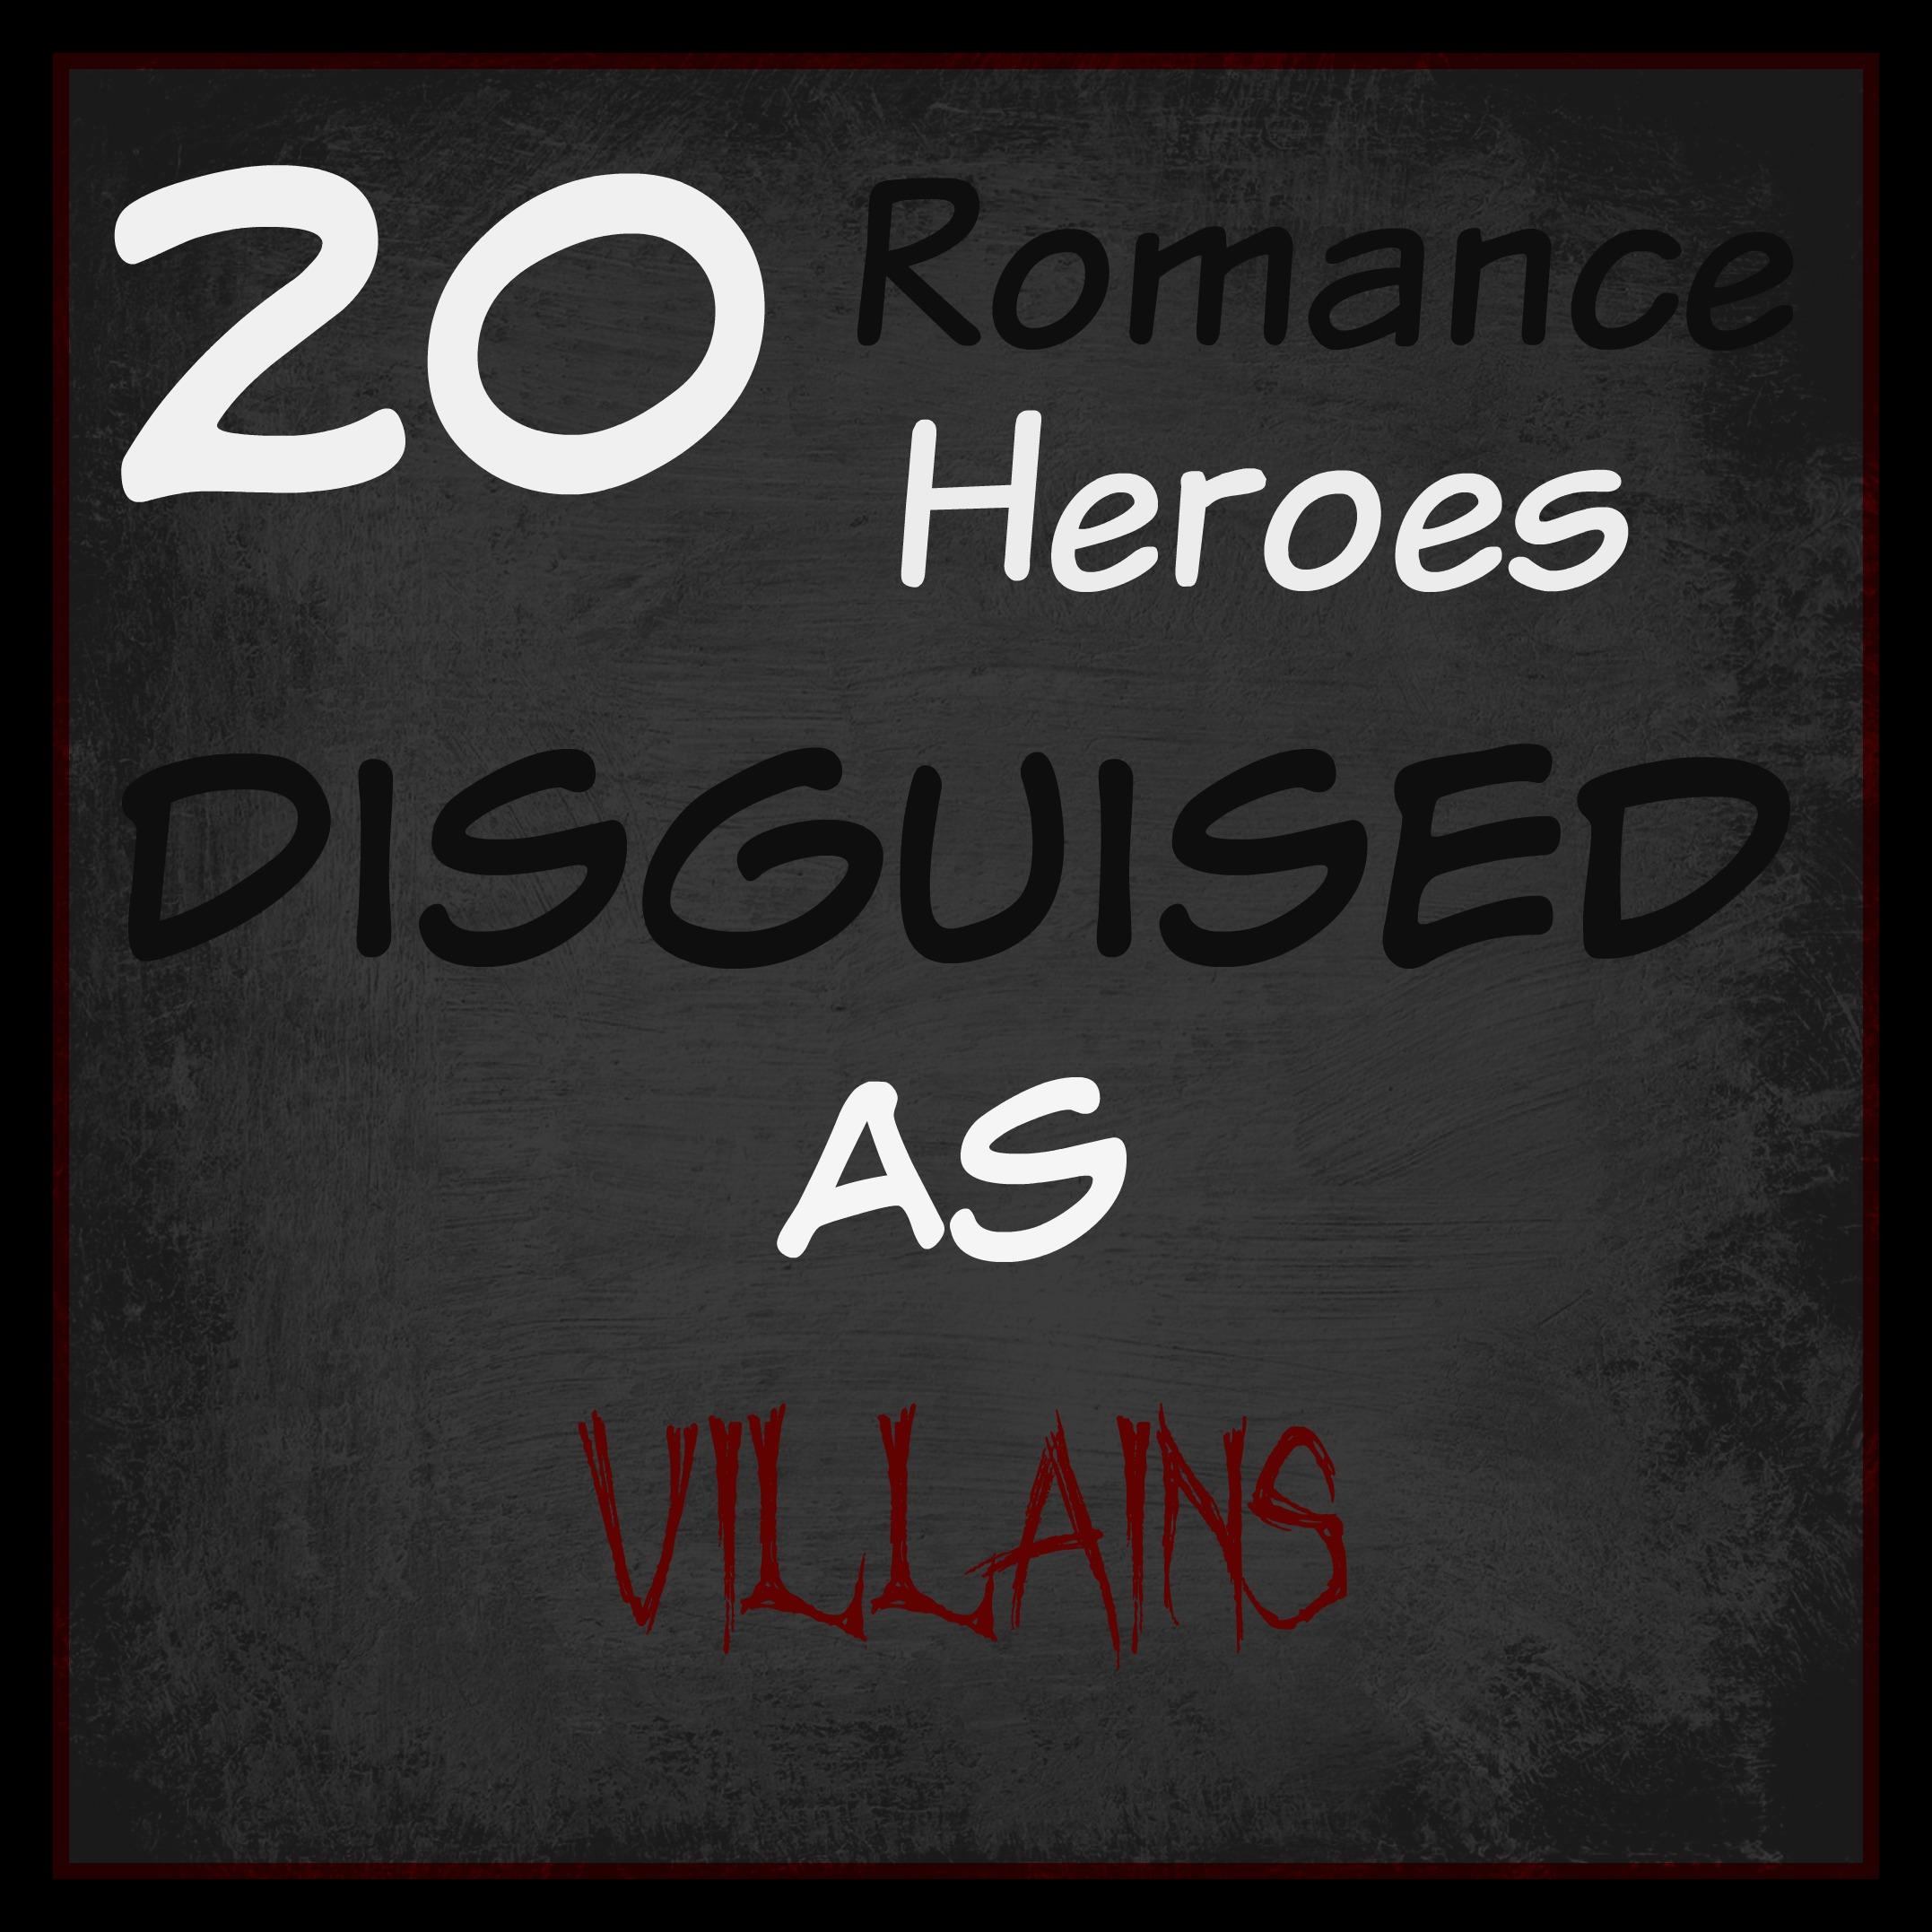 20 Romance Heroes Disguised as Villains | Darla G  Denton